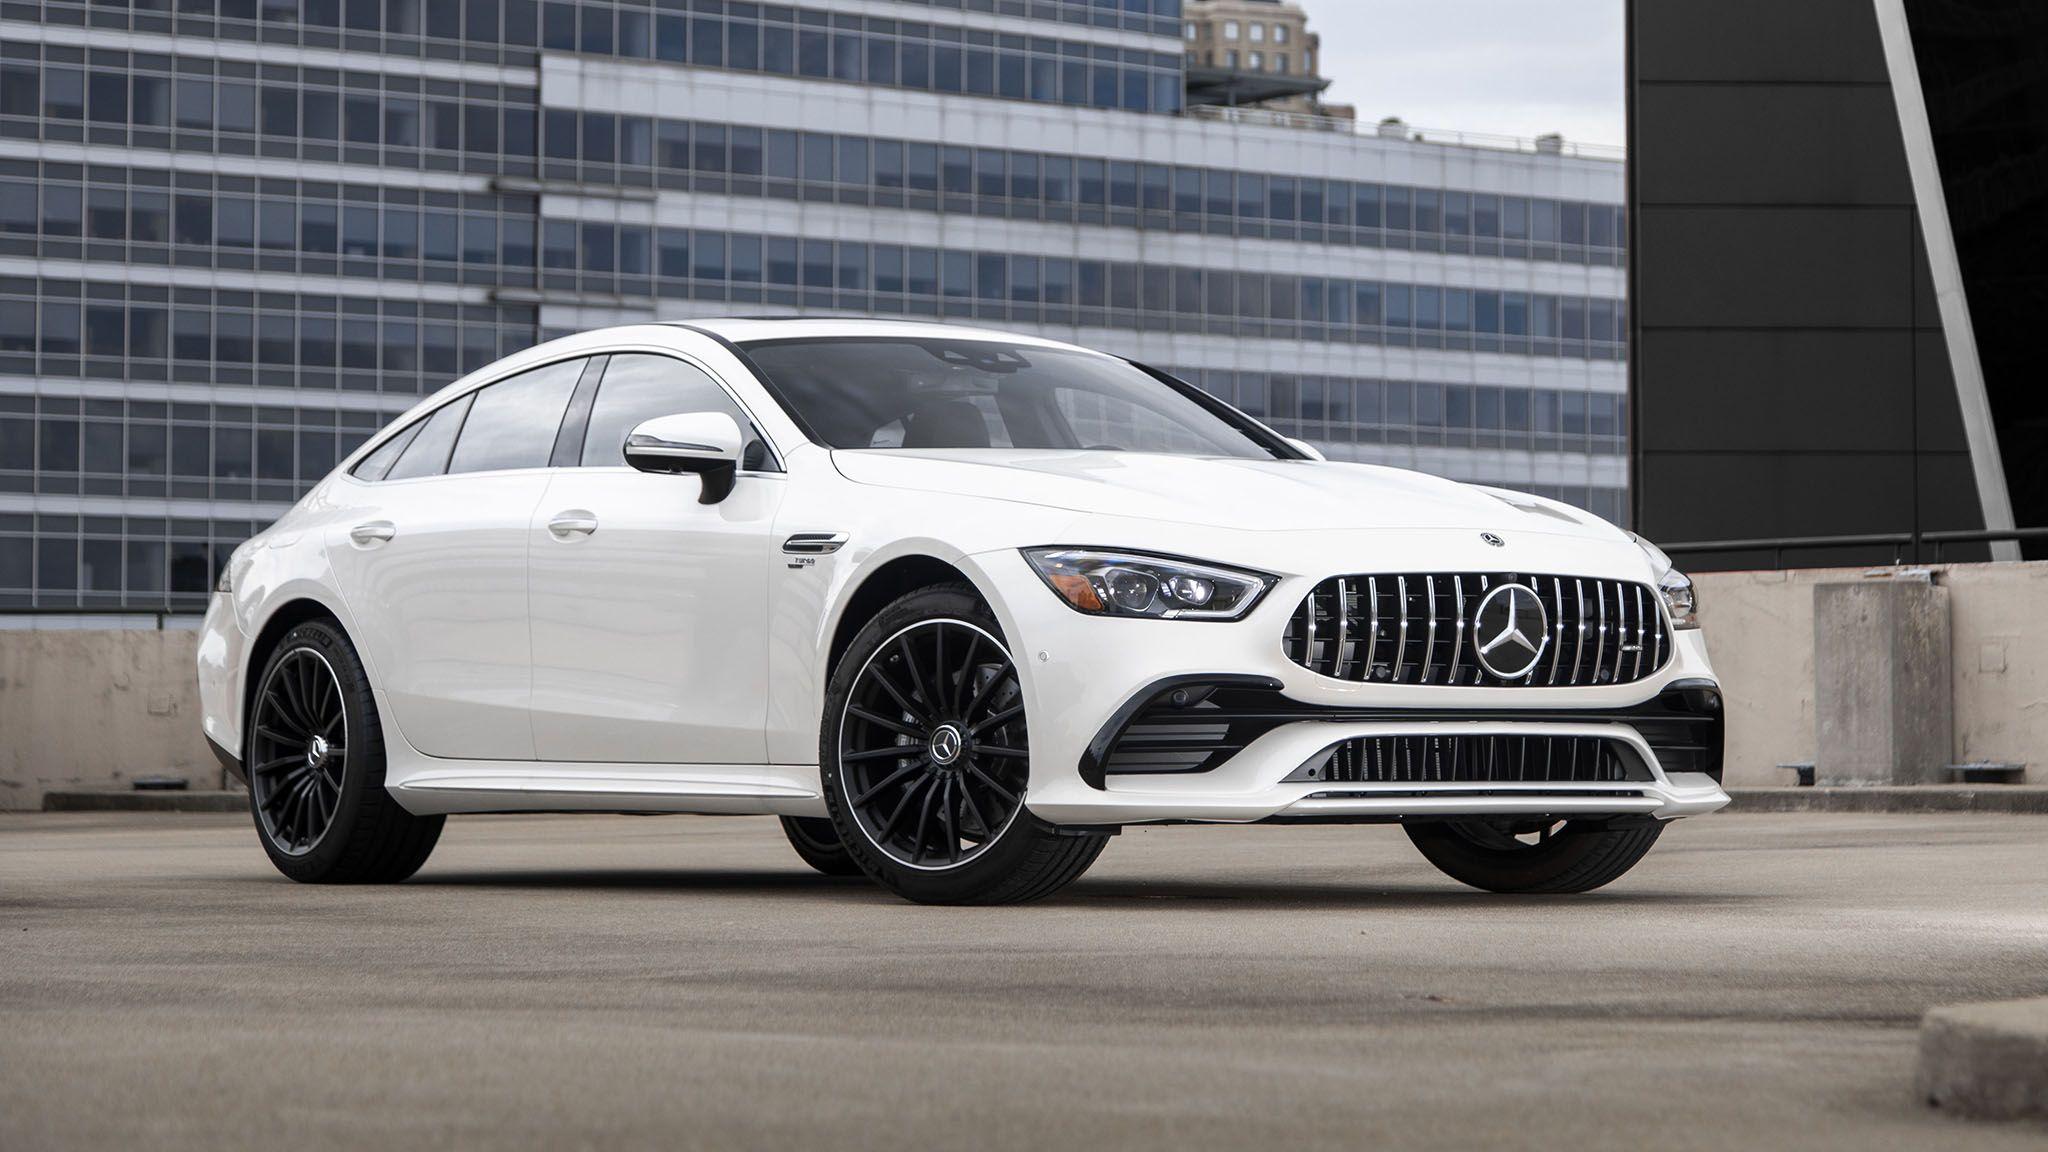 2021 Mercedes Amg Gt 43 4 Door Is The Budget Amg Sedan In 2020 Mercedes Amg Amg Mercedes